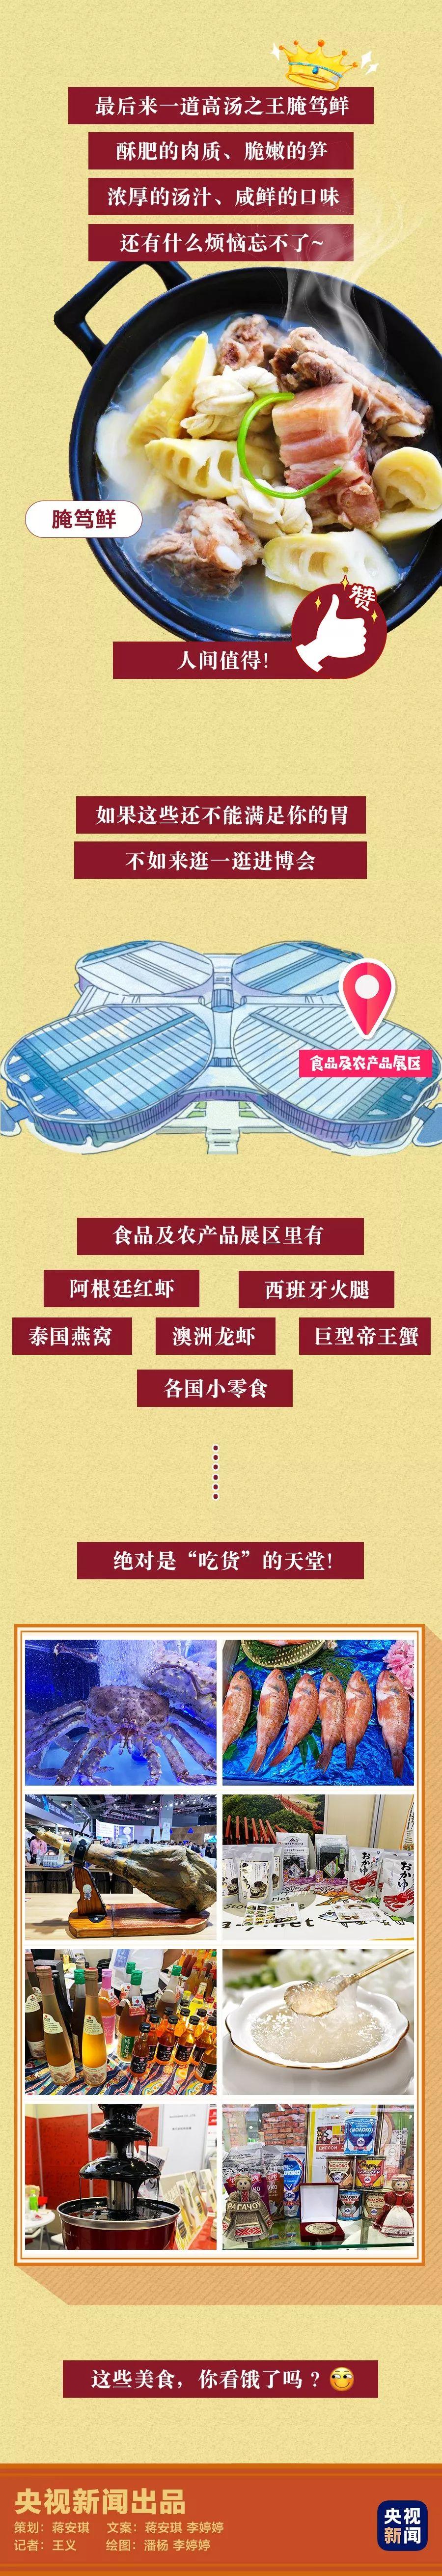 bbin宝盈客服 - 一带一路轨道交通论坛探讨中国铁路装备与技术国际化